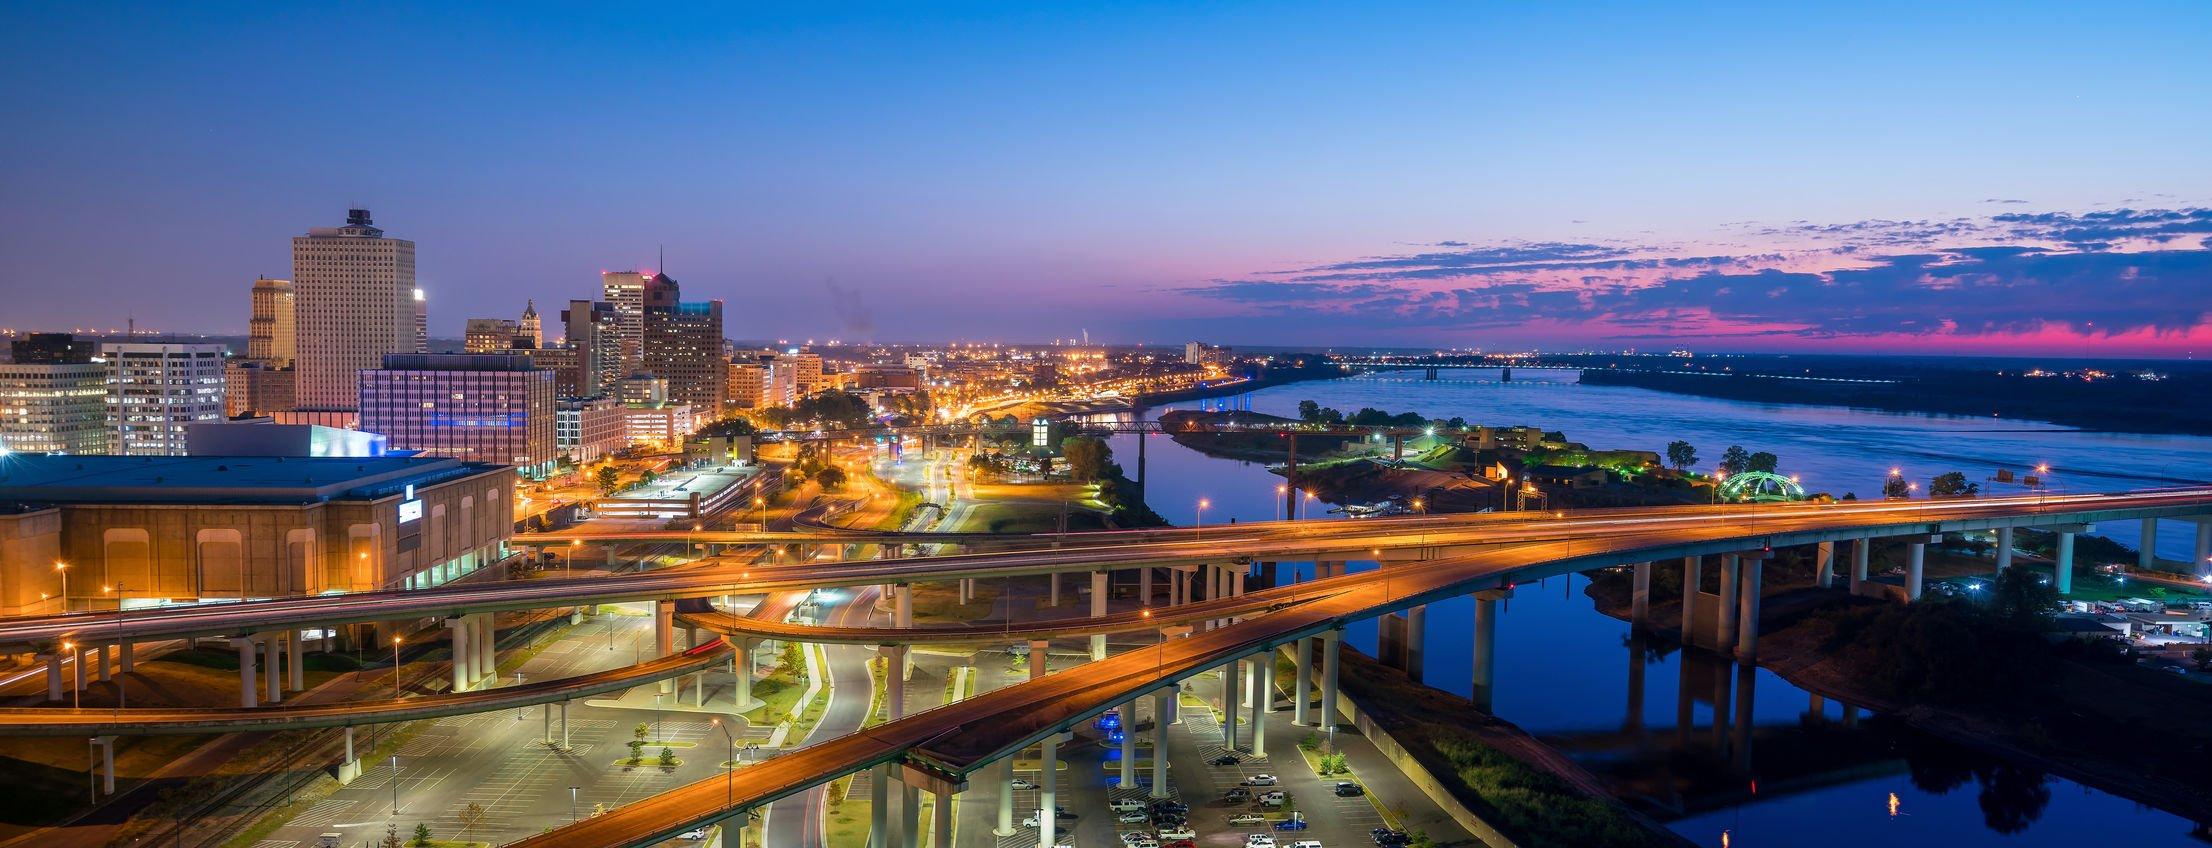 The Baha'i Faith in Memphis and the Midsouth